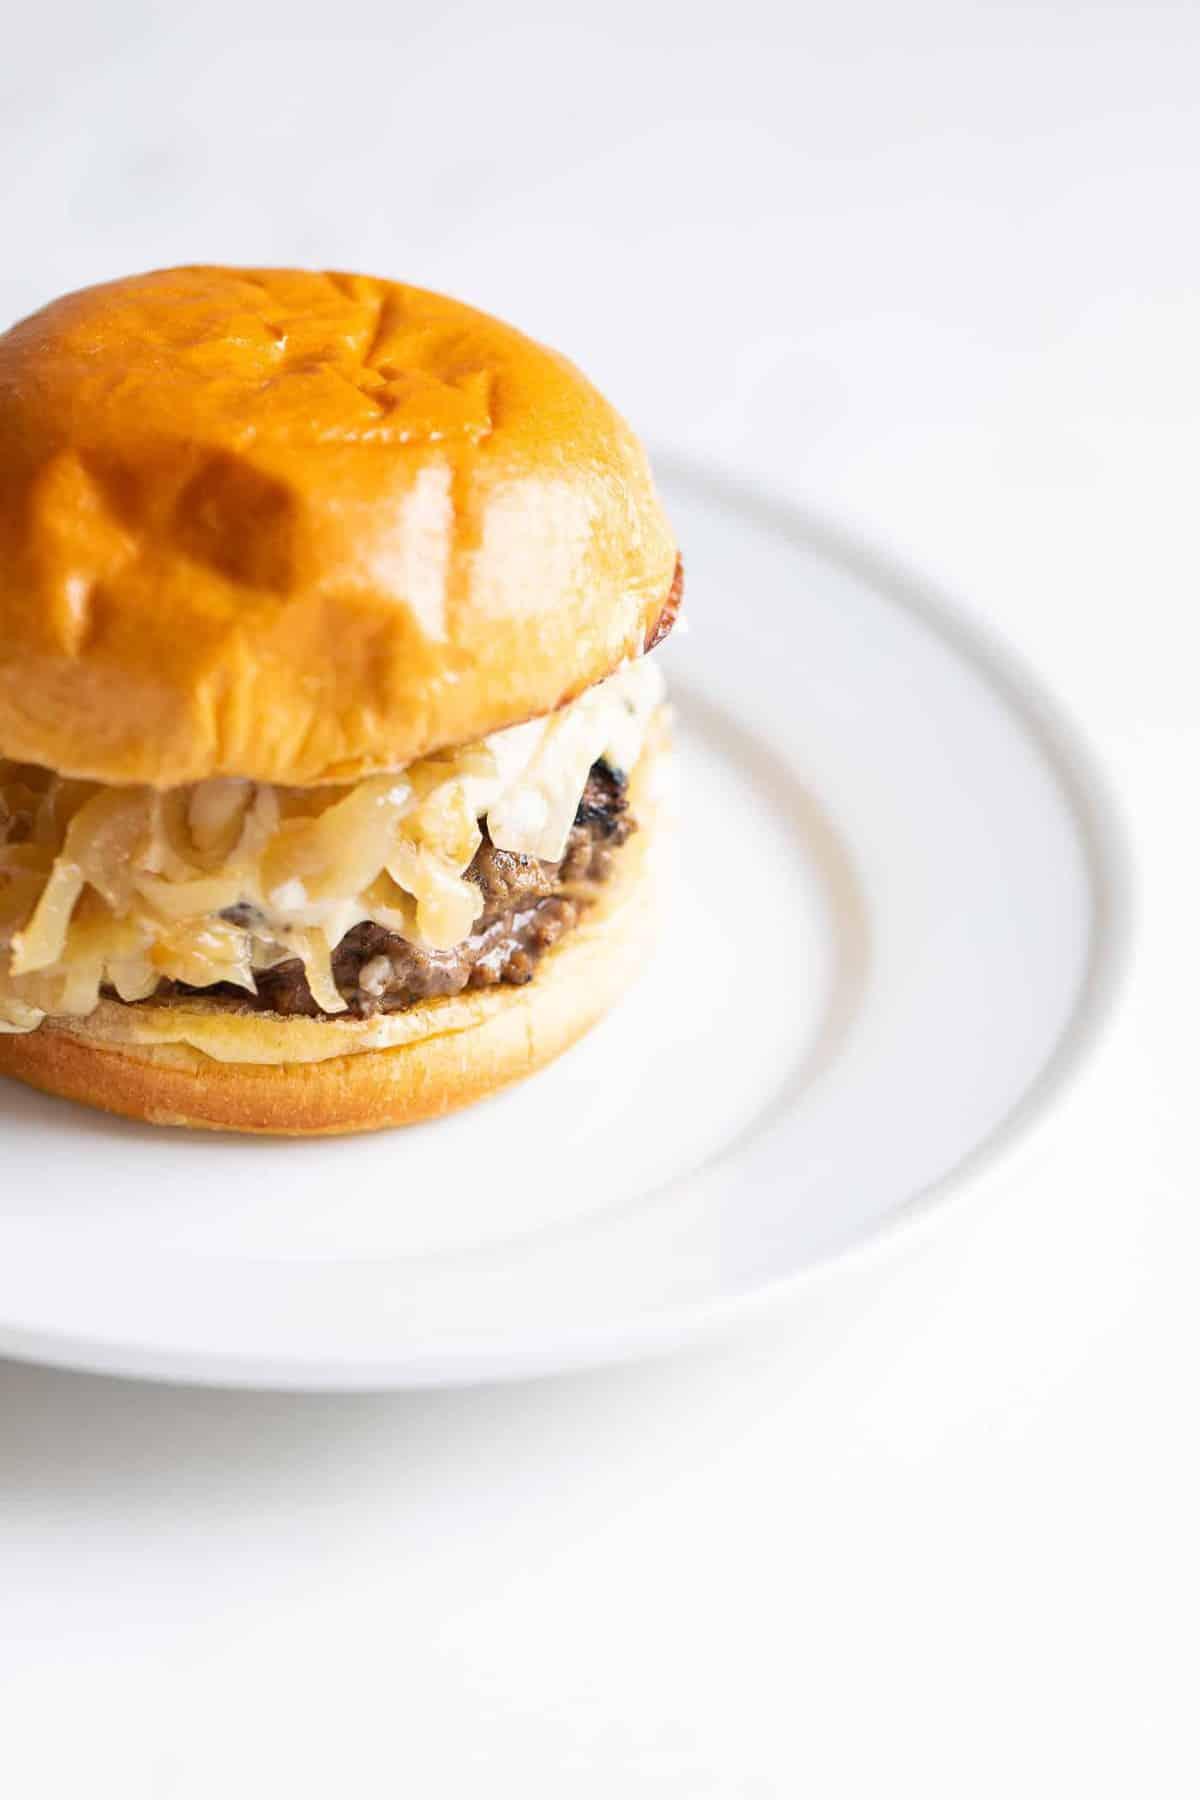 White surface, white place featuring a gourmet burger on a brioche bun.